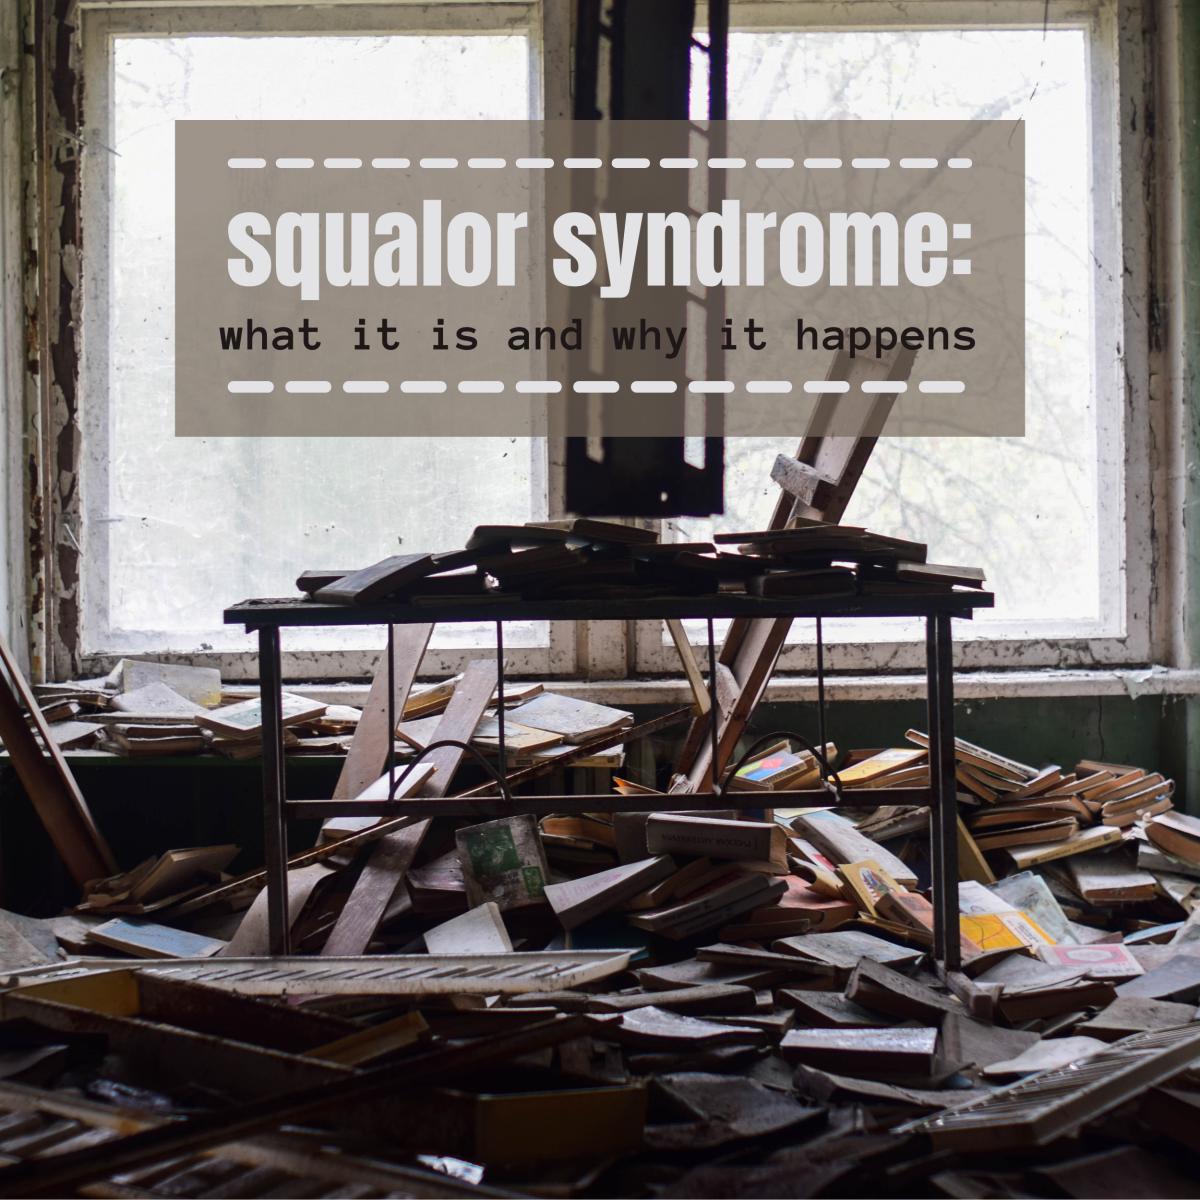 Understanding Squalor Syndrome